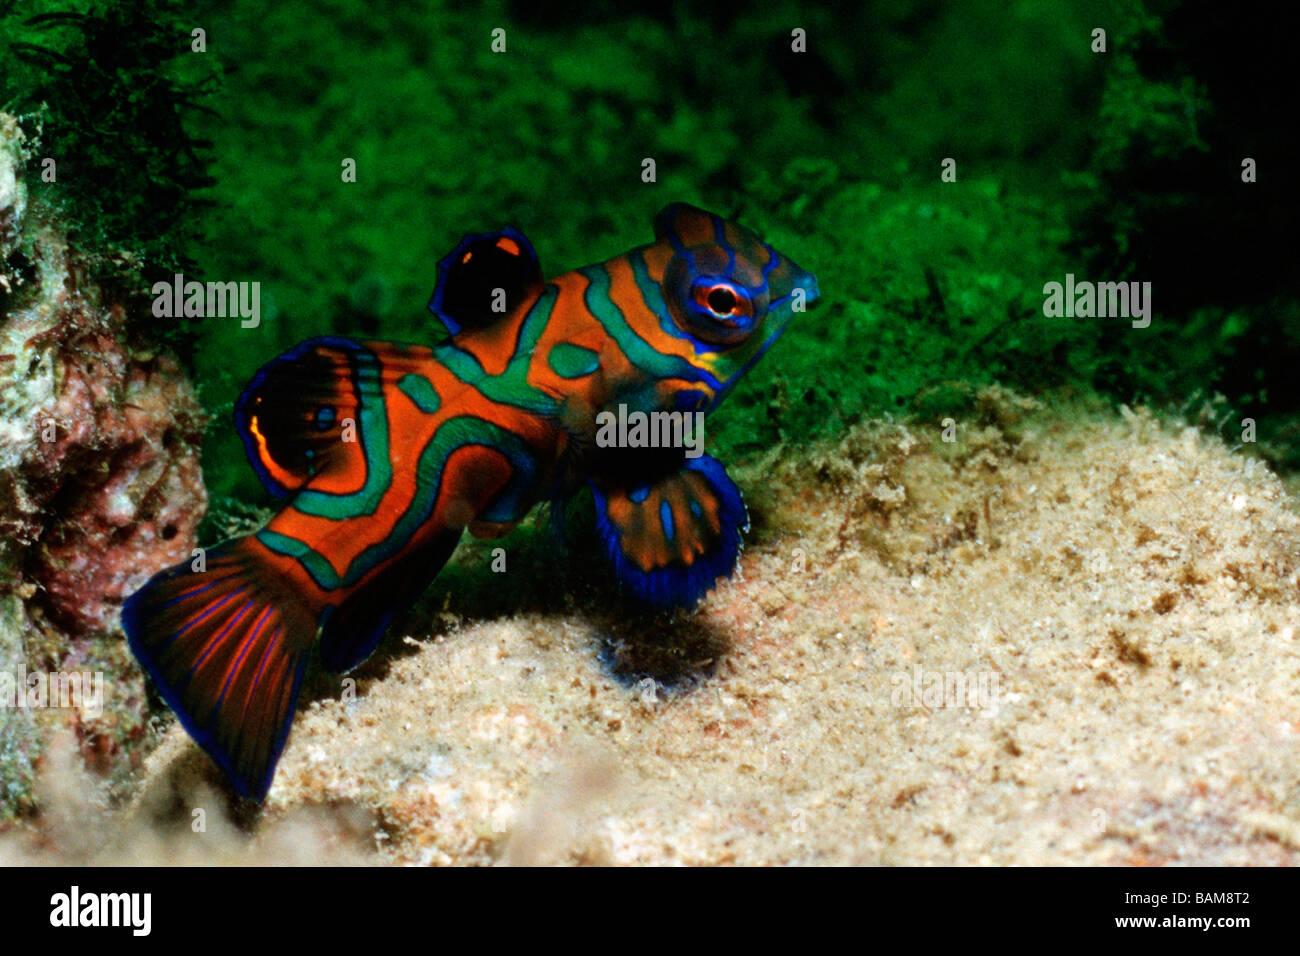 Mandarinfish Synchiropus splendidus Pacific Micronesia Palau - Stock Image